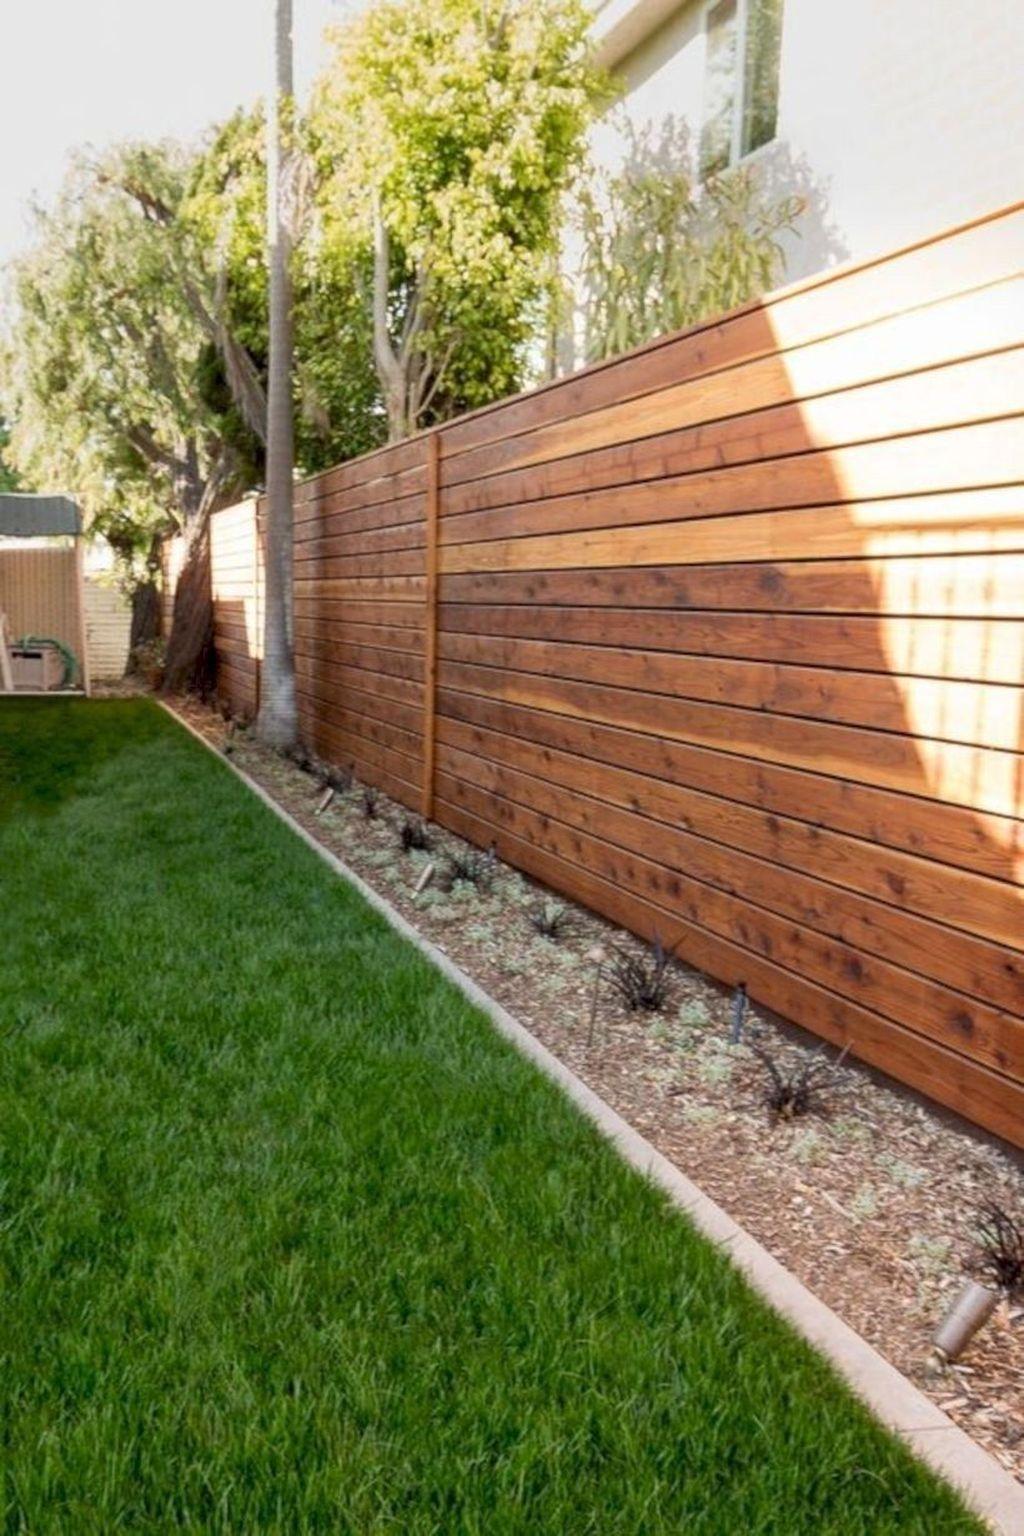 20 Smart Backyard Fence And Garden Design Ideas For Your Garden Backyard Fences Backyard Wood Fence Design